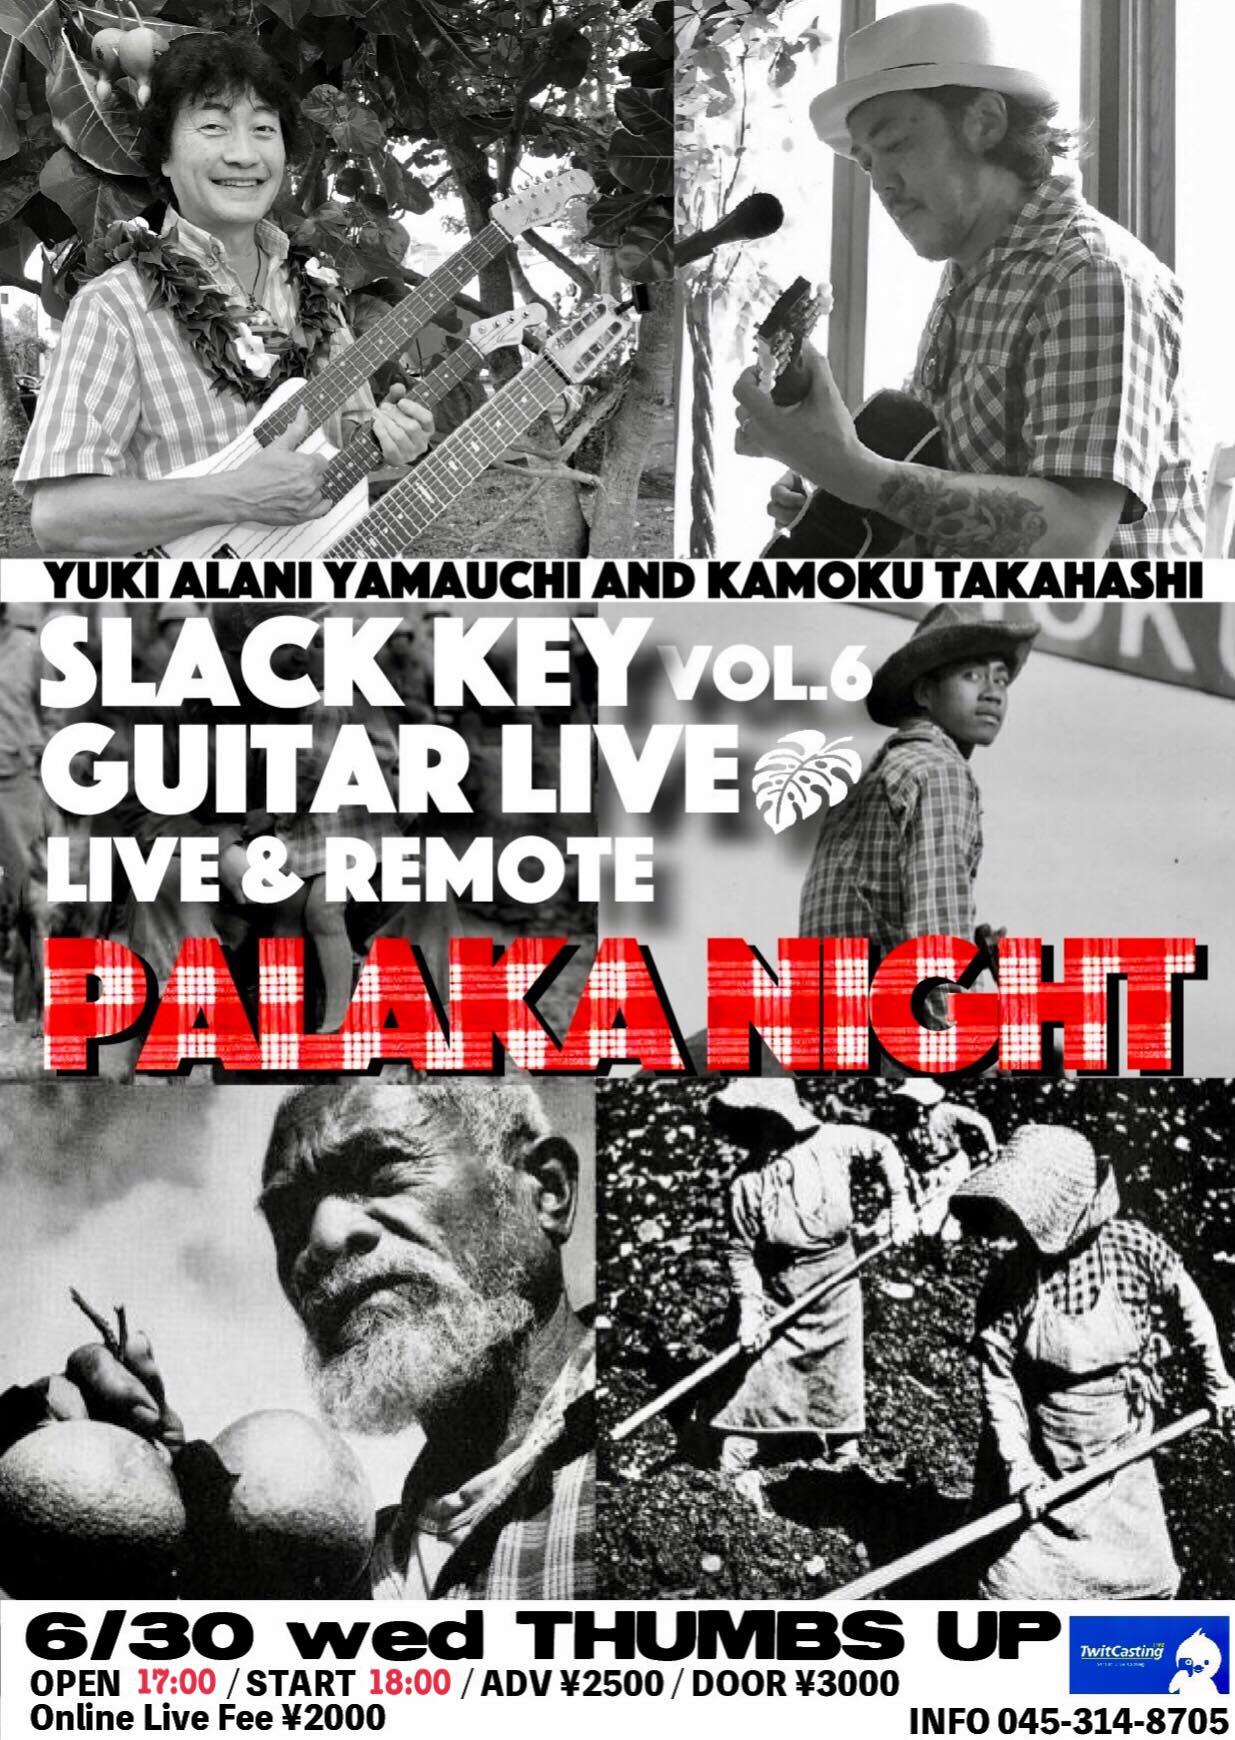 神奈川 Slack Key Guitar Live Vol. 6 PALAKA NIGHT @ Thumbs Up   名古屋市   愛知県   日本